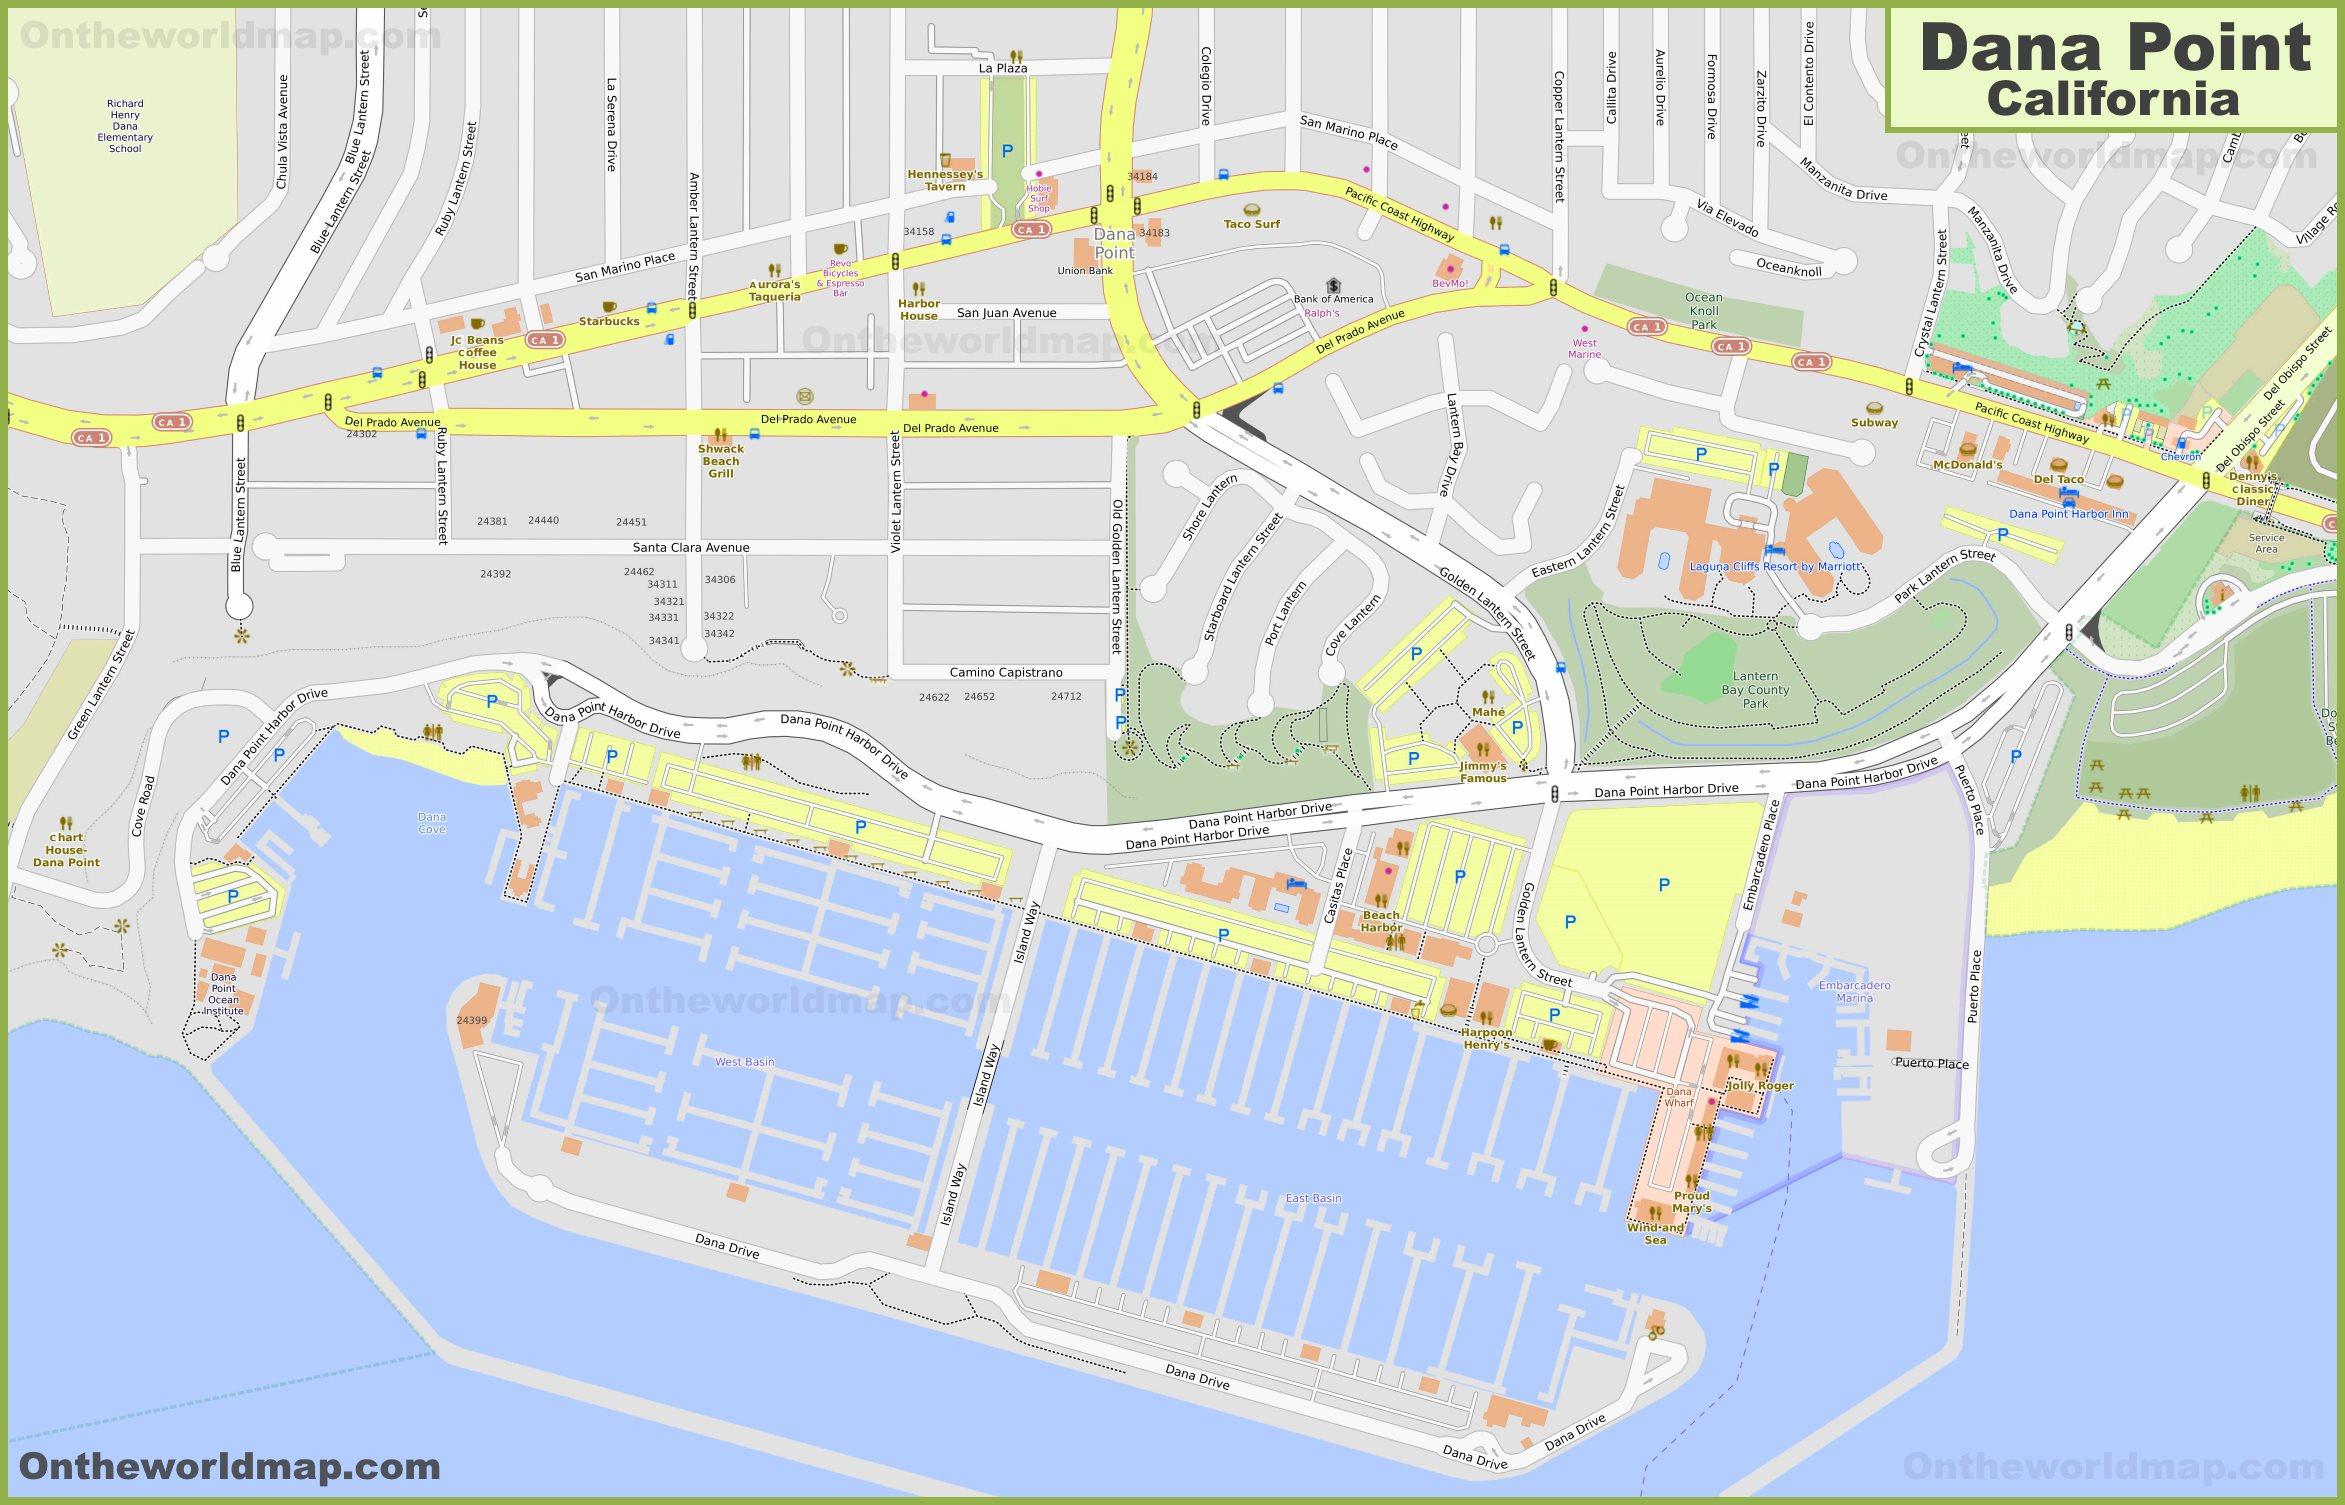 Dana Point City Center Map on